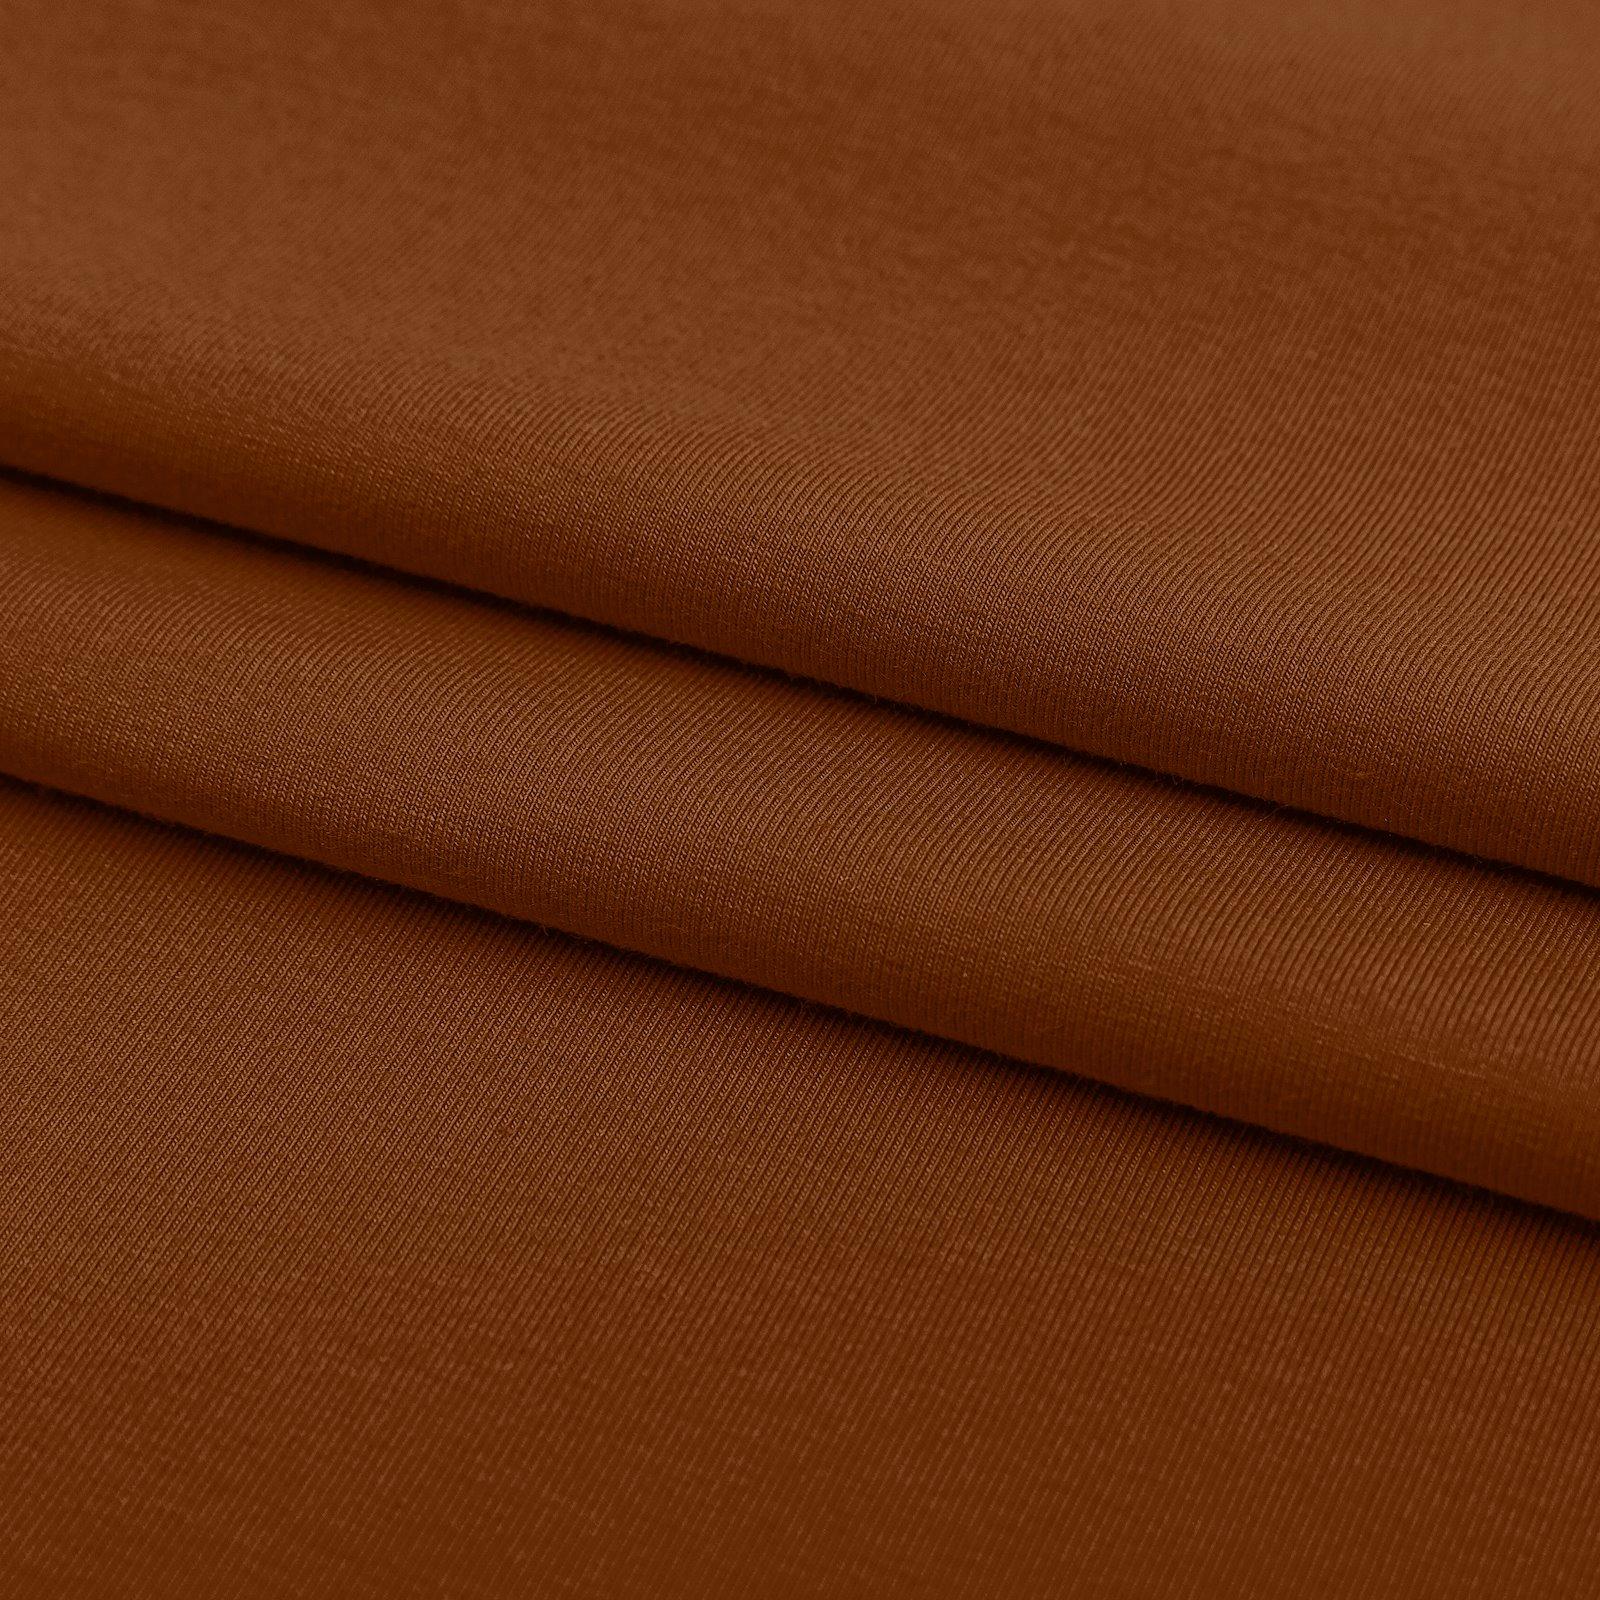 Organic stretch jersey dark caramel 272655_pack_d